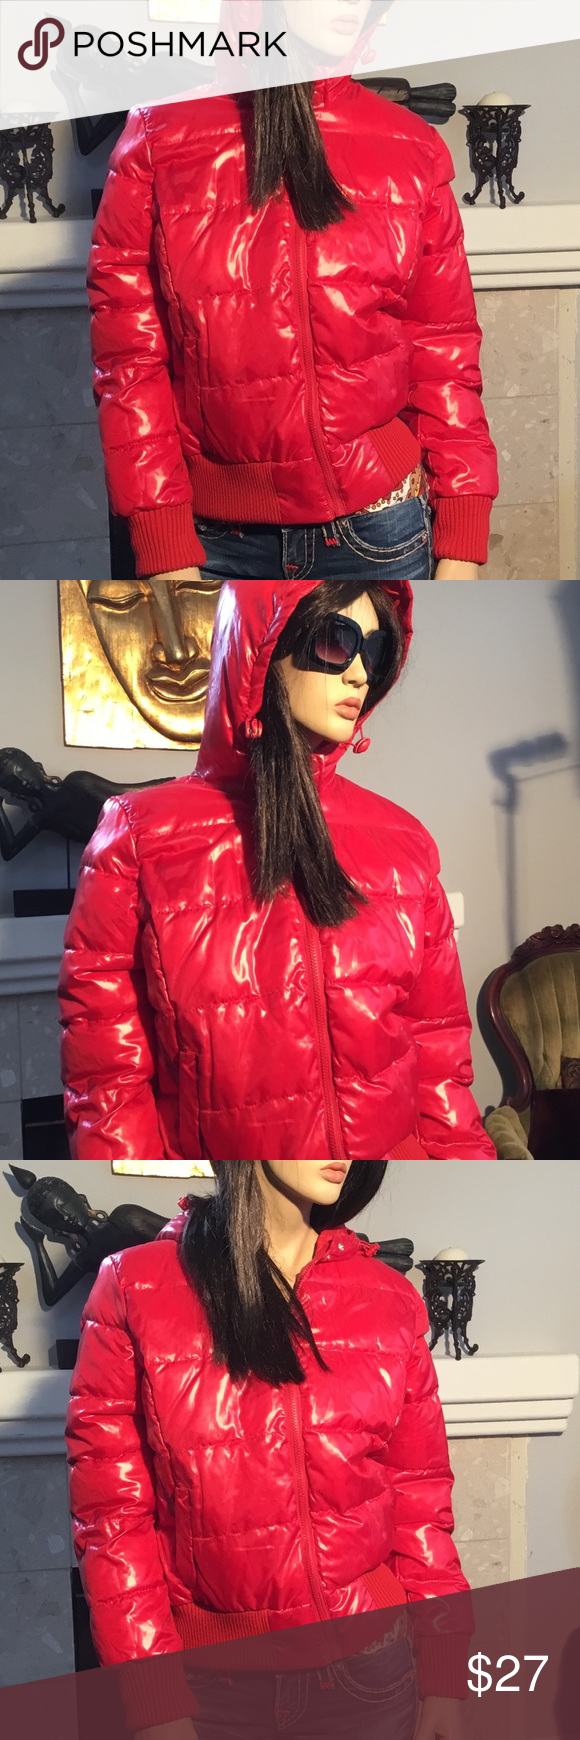 Aeropostale Red Puffer Jacket Coat Hood L T241 Red Puffer Jacket Hooded Coat Puffer Jackets [ 1740 x 580 Pixel ]